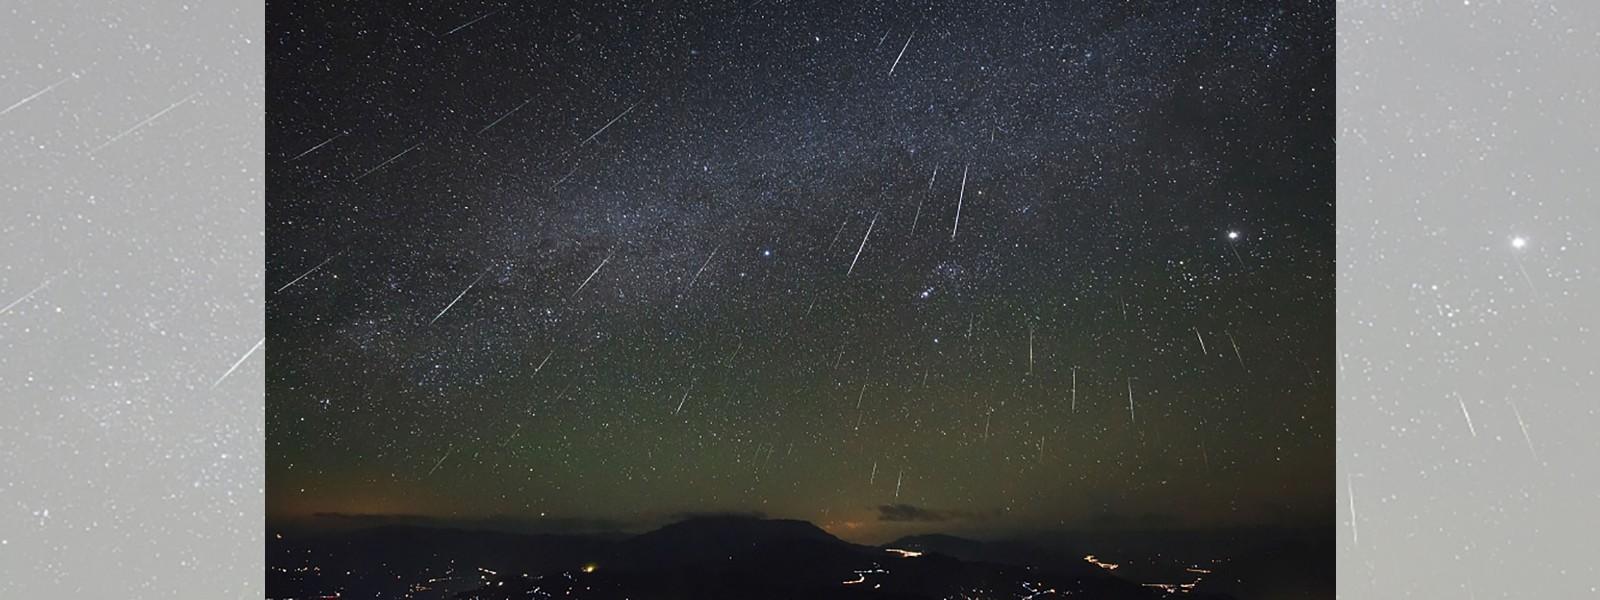 Geminid meteor shower visible to Sri Lanka sky tonight